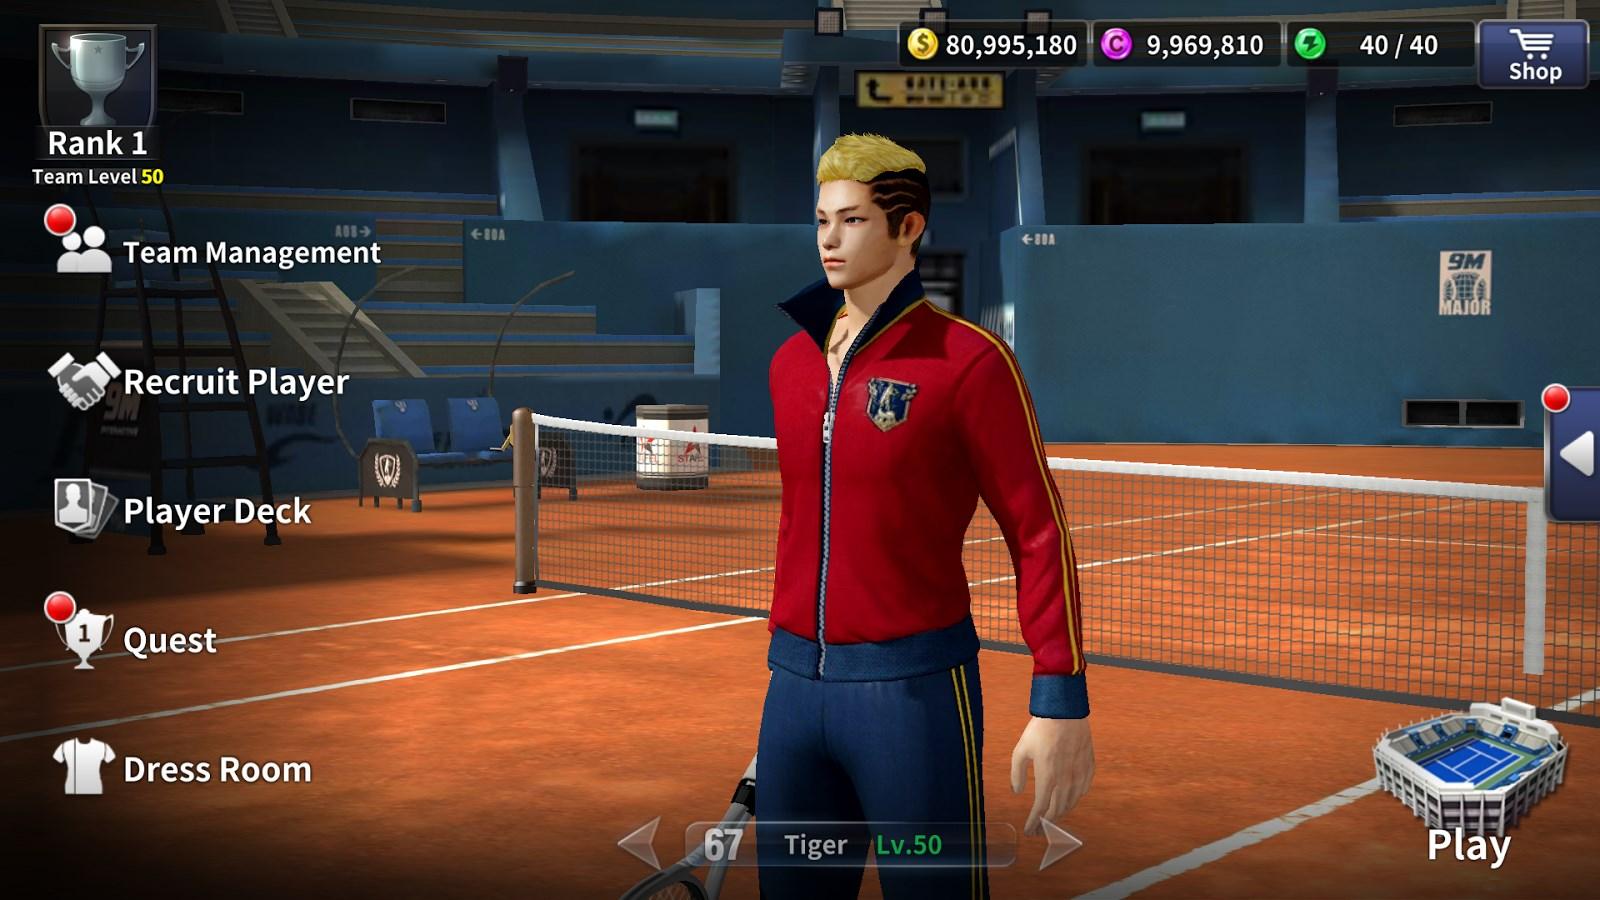 Ultimate Tennis - Imagem 1 do software